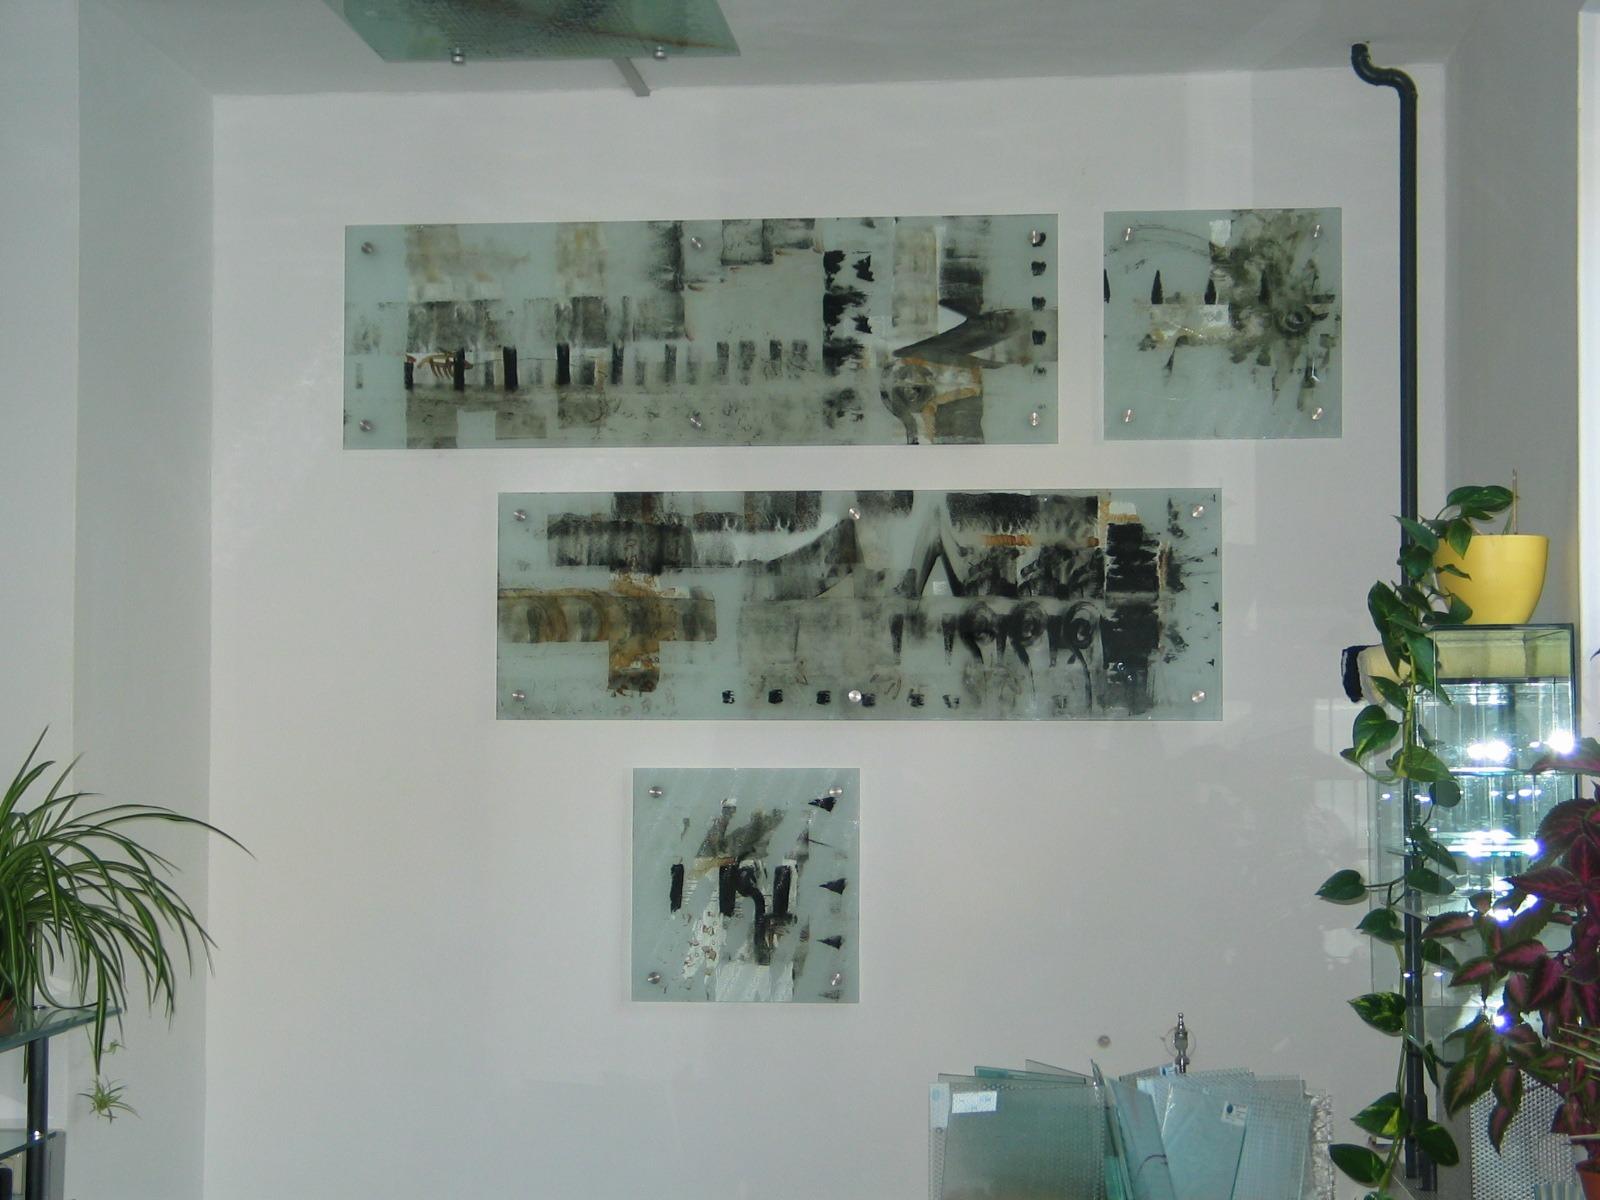 Wandbild Klarglas sandegstrahlt und bemalt